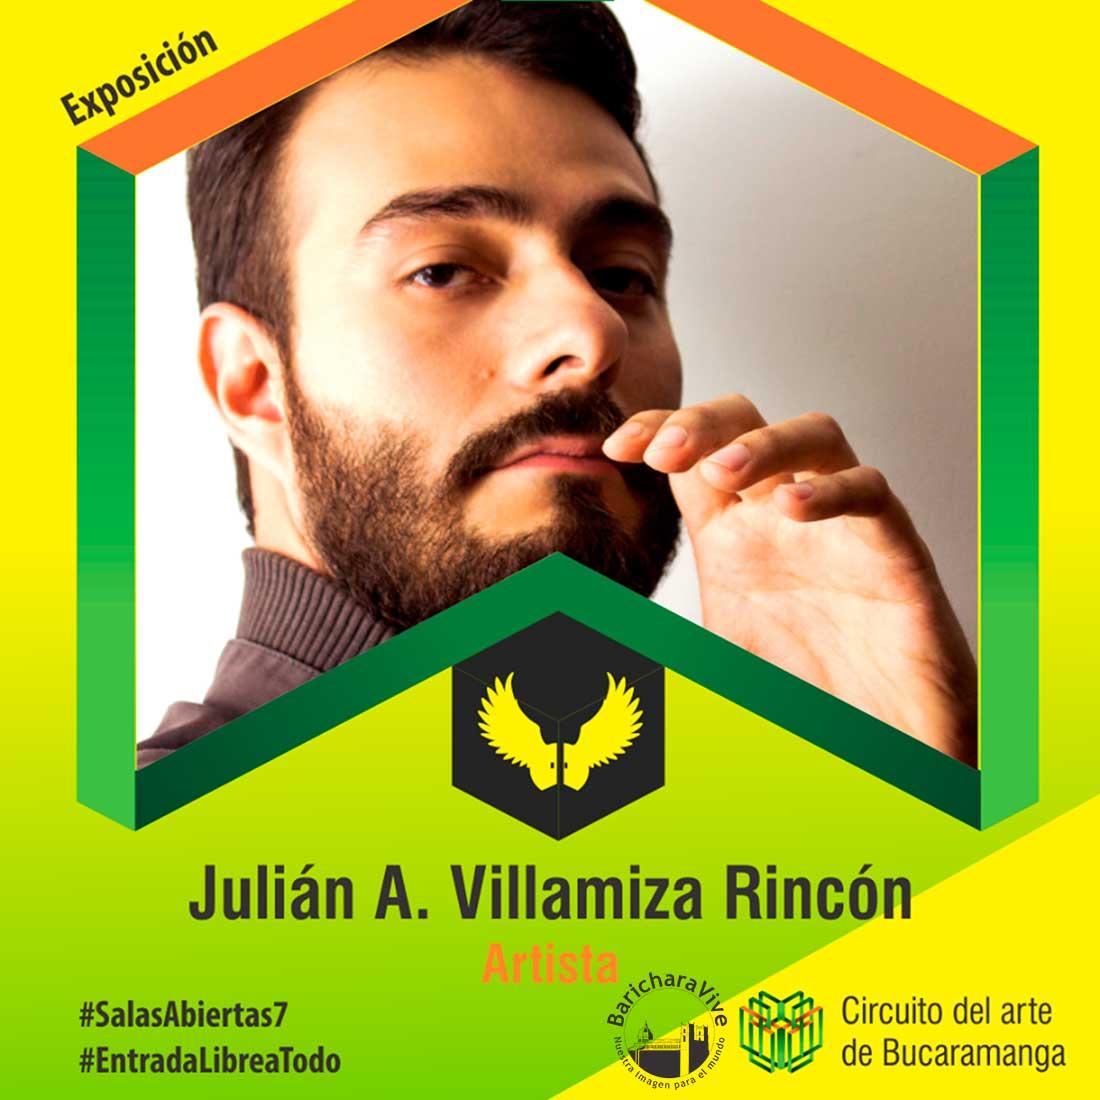 artista-juliian-villamizar-7a-edicion-el-centro-con-las-salas-abiertas-bucaramanga-2017